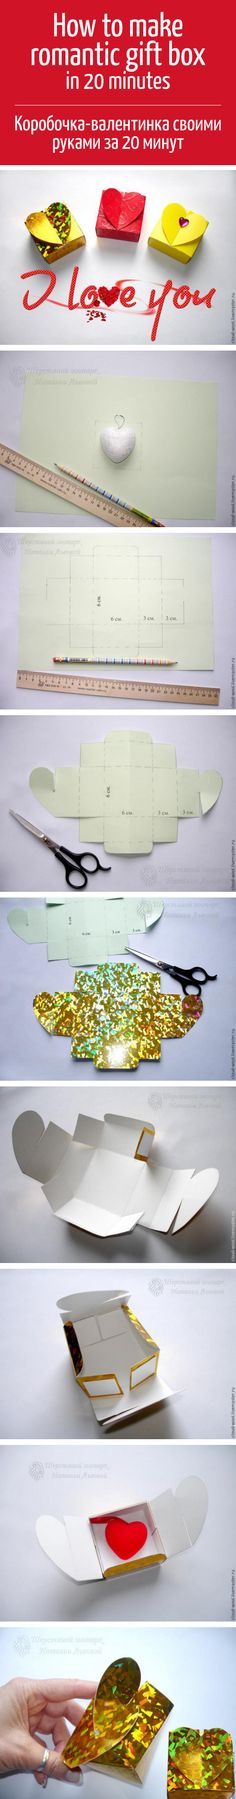 Делаем коробочку-валентинку своими руками / How to make romantic gift box DIY